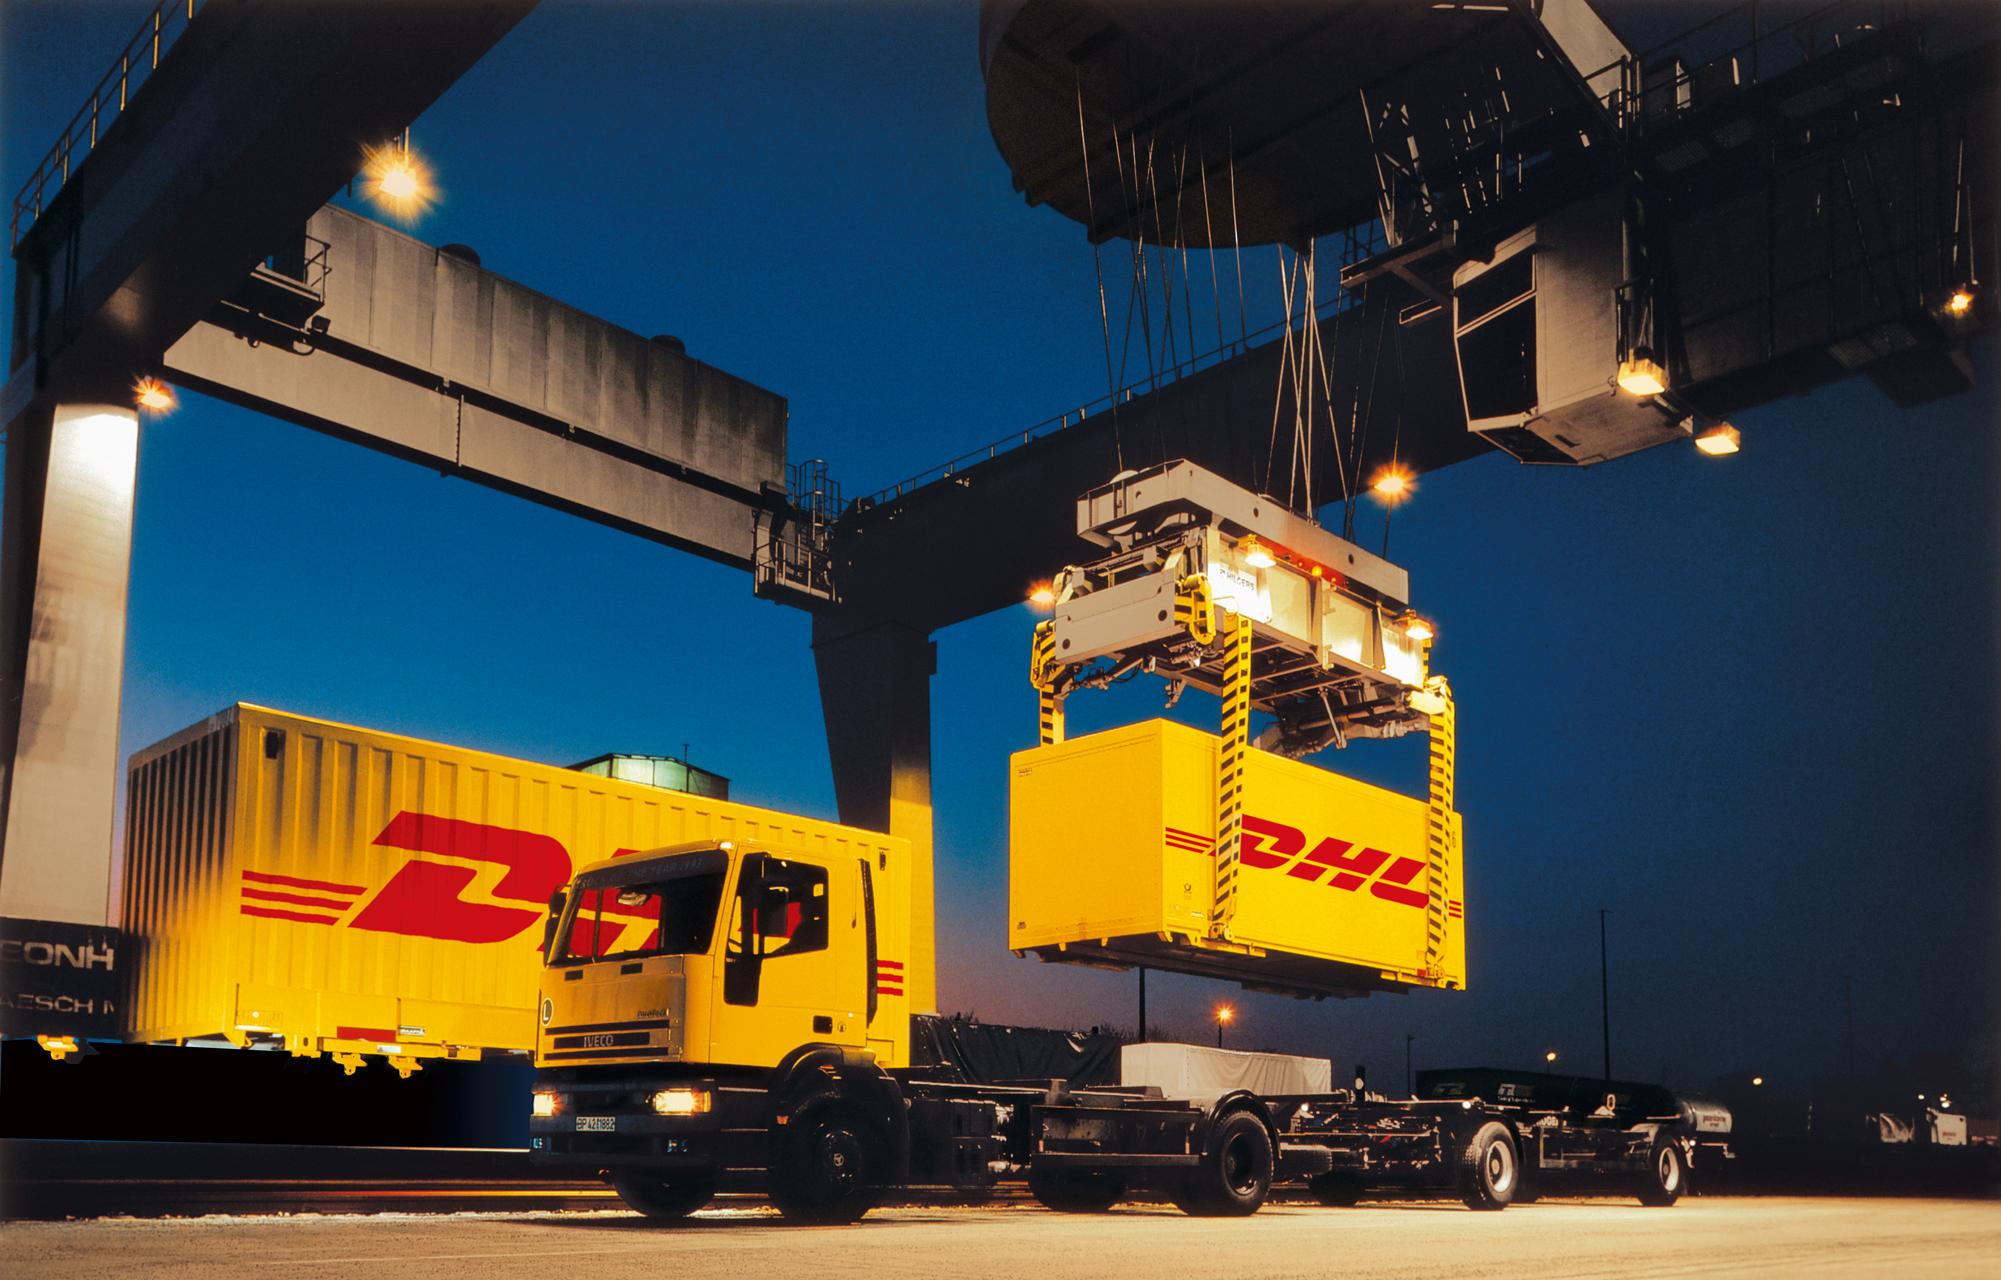 DHL Freight announces tariff increase